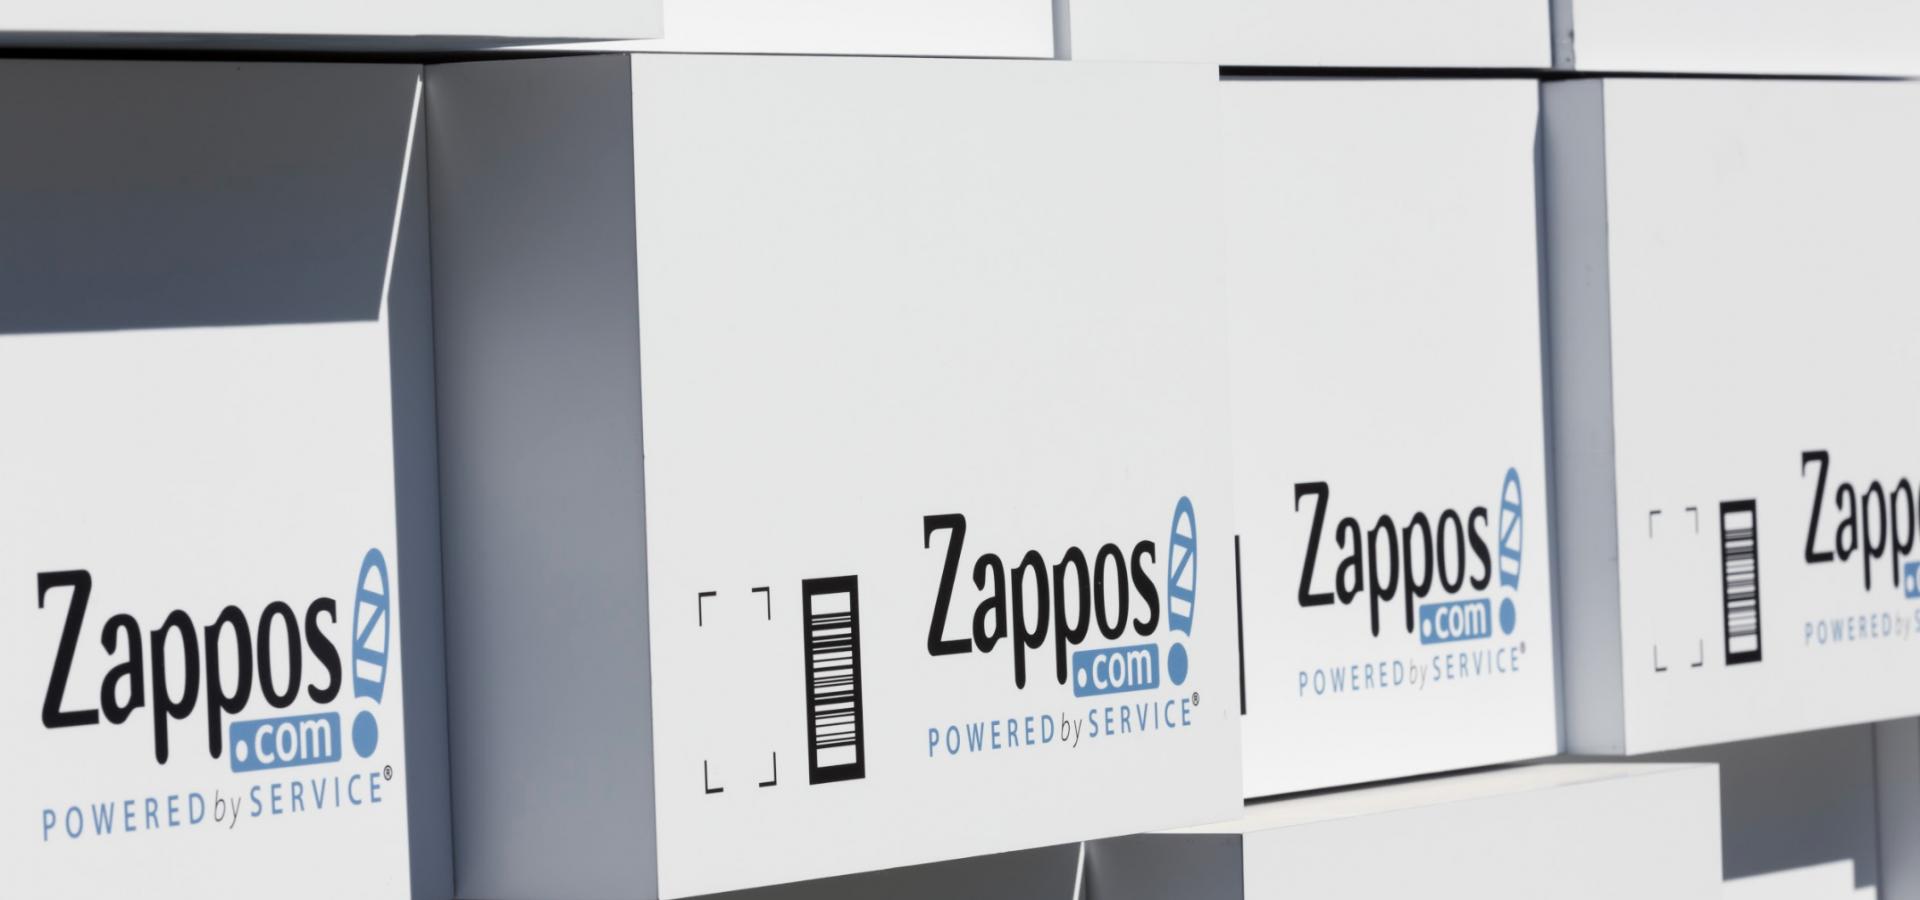 Zappos - Tour Kinnetic Wall